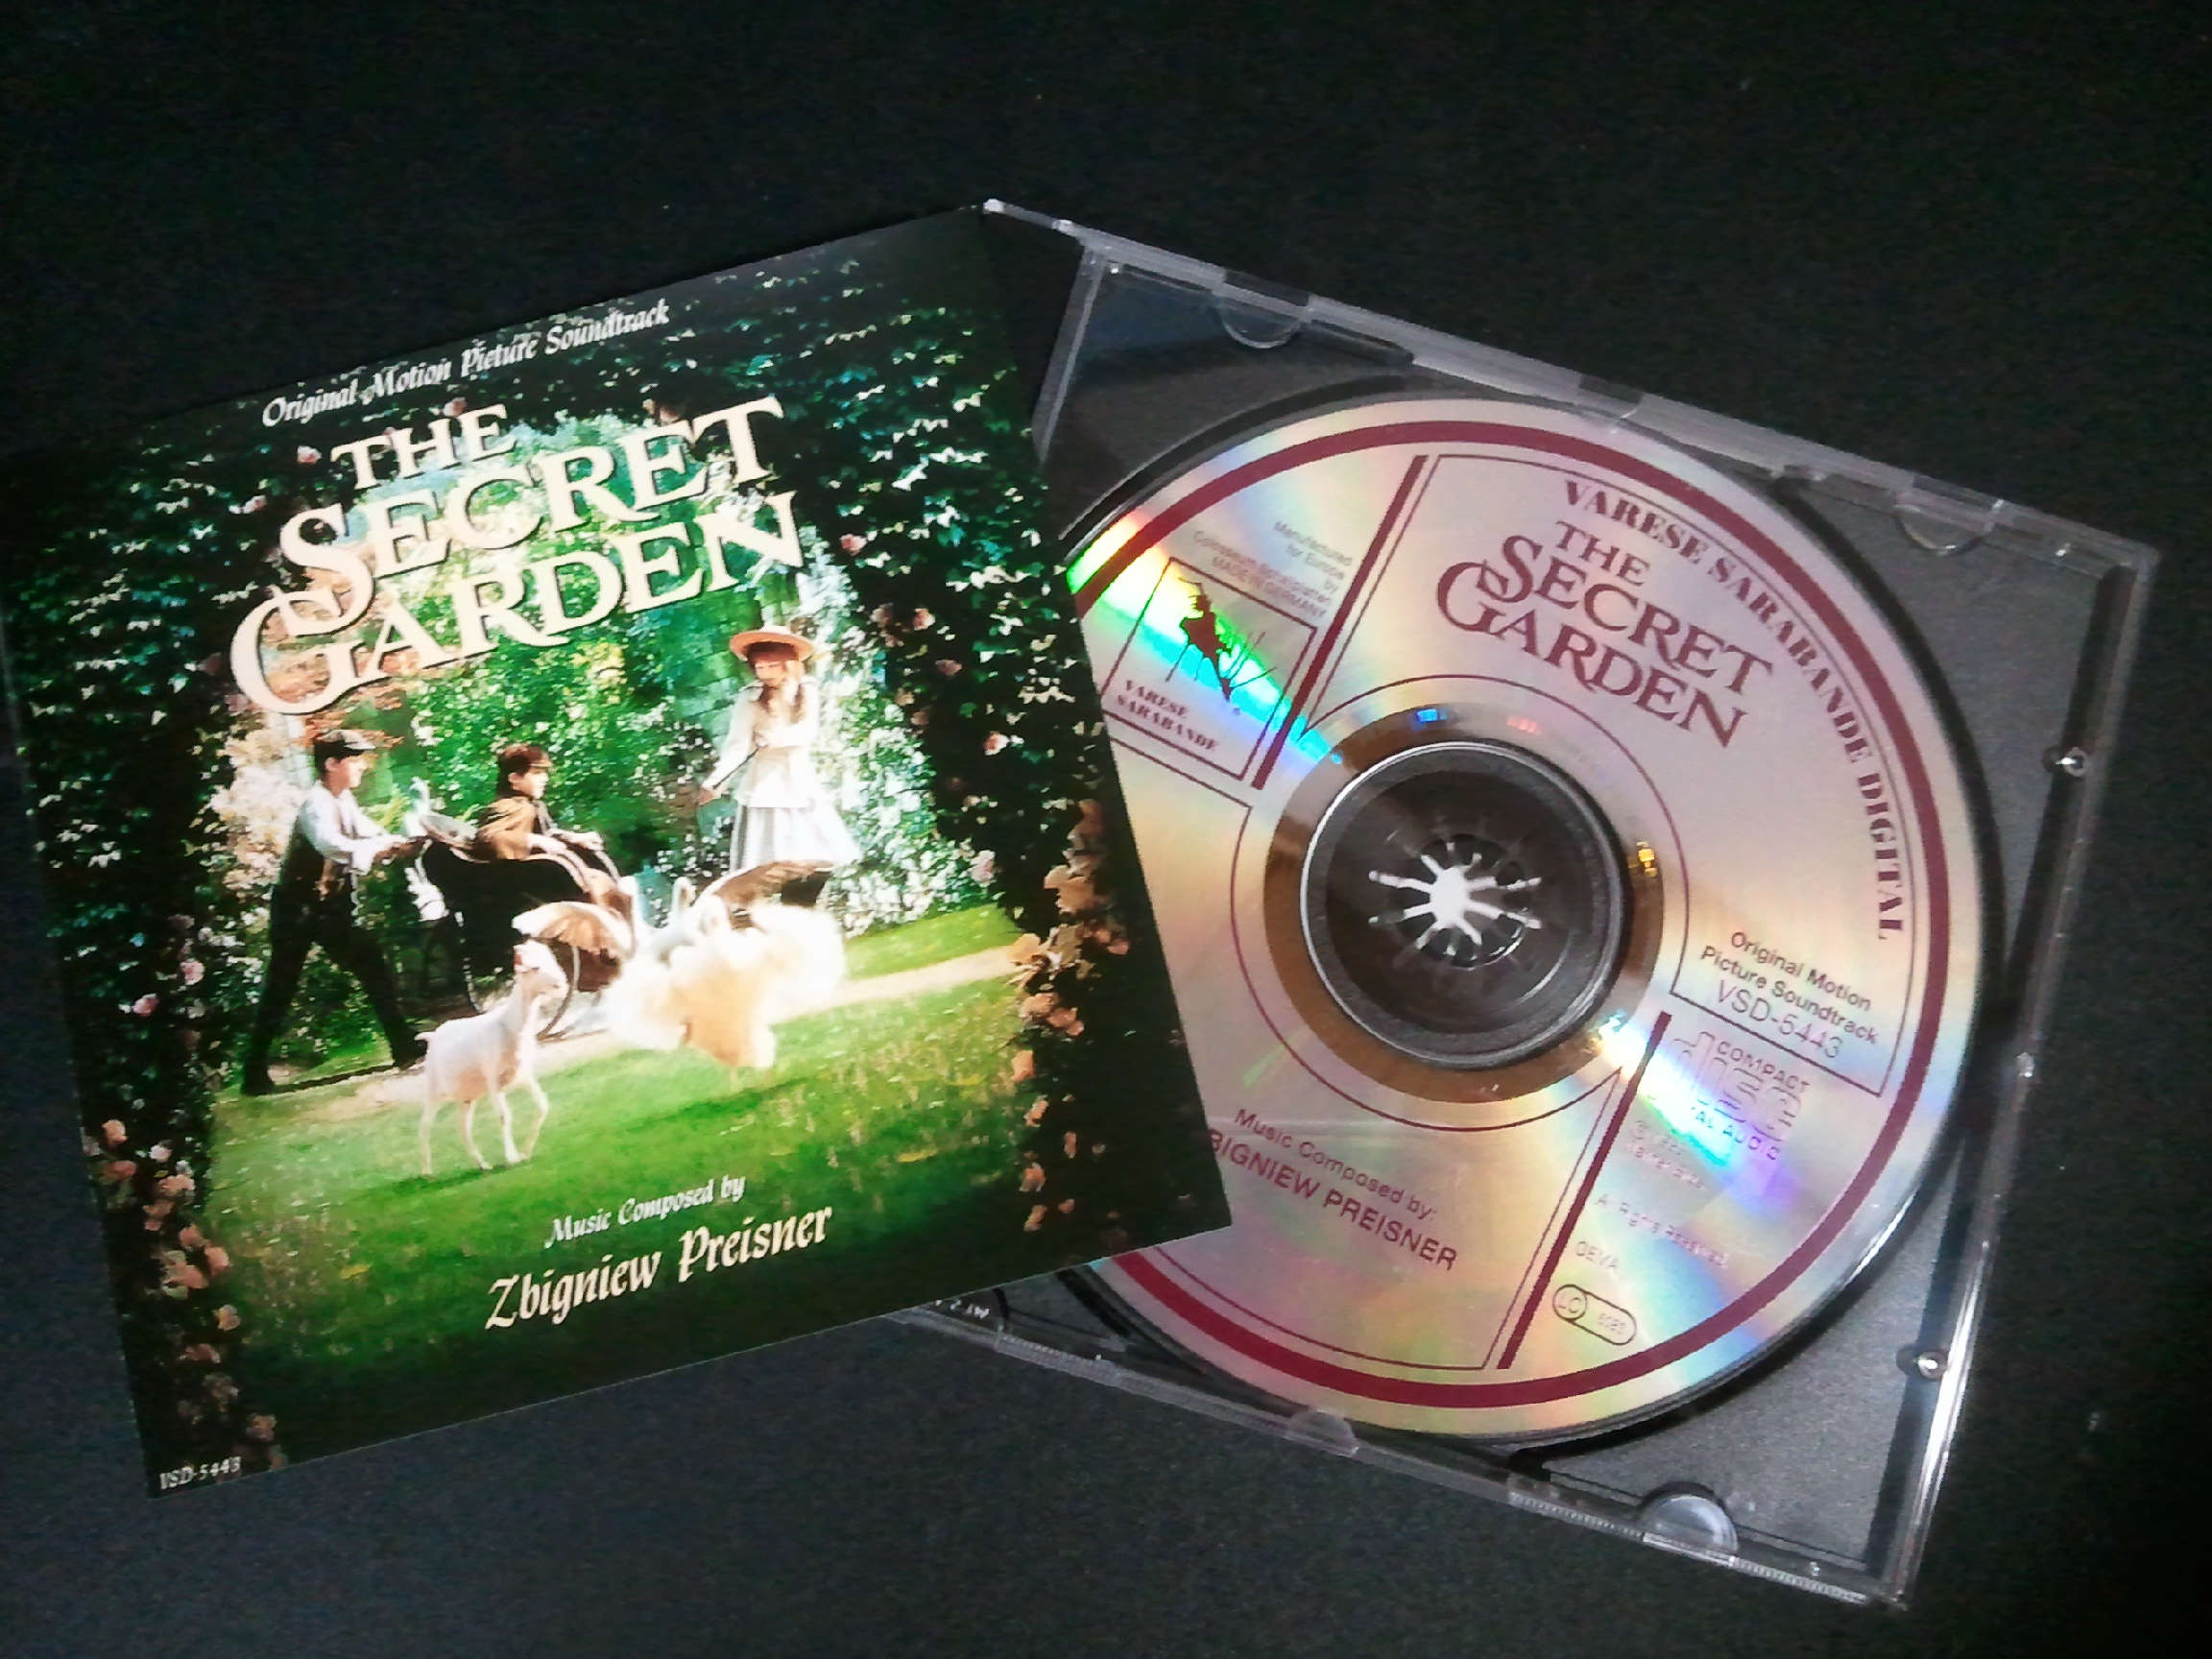 Secret Garden soundtrack